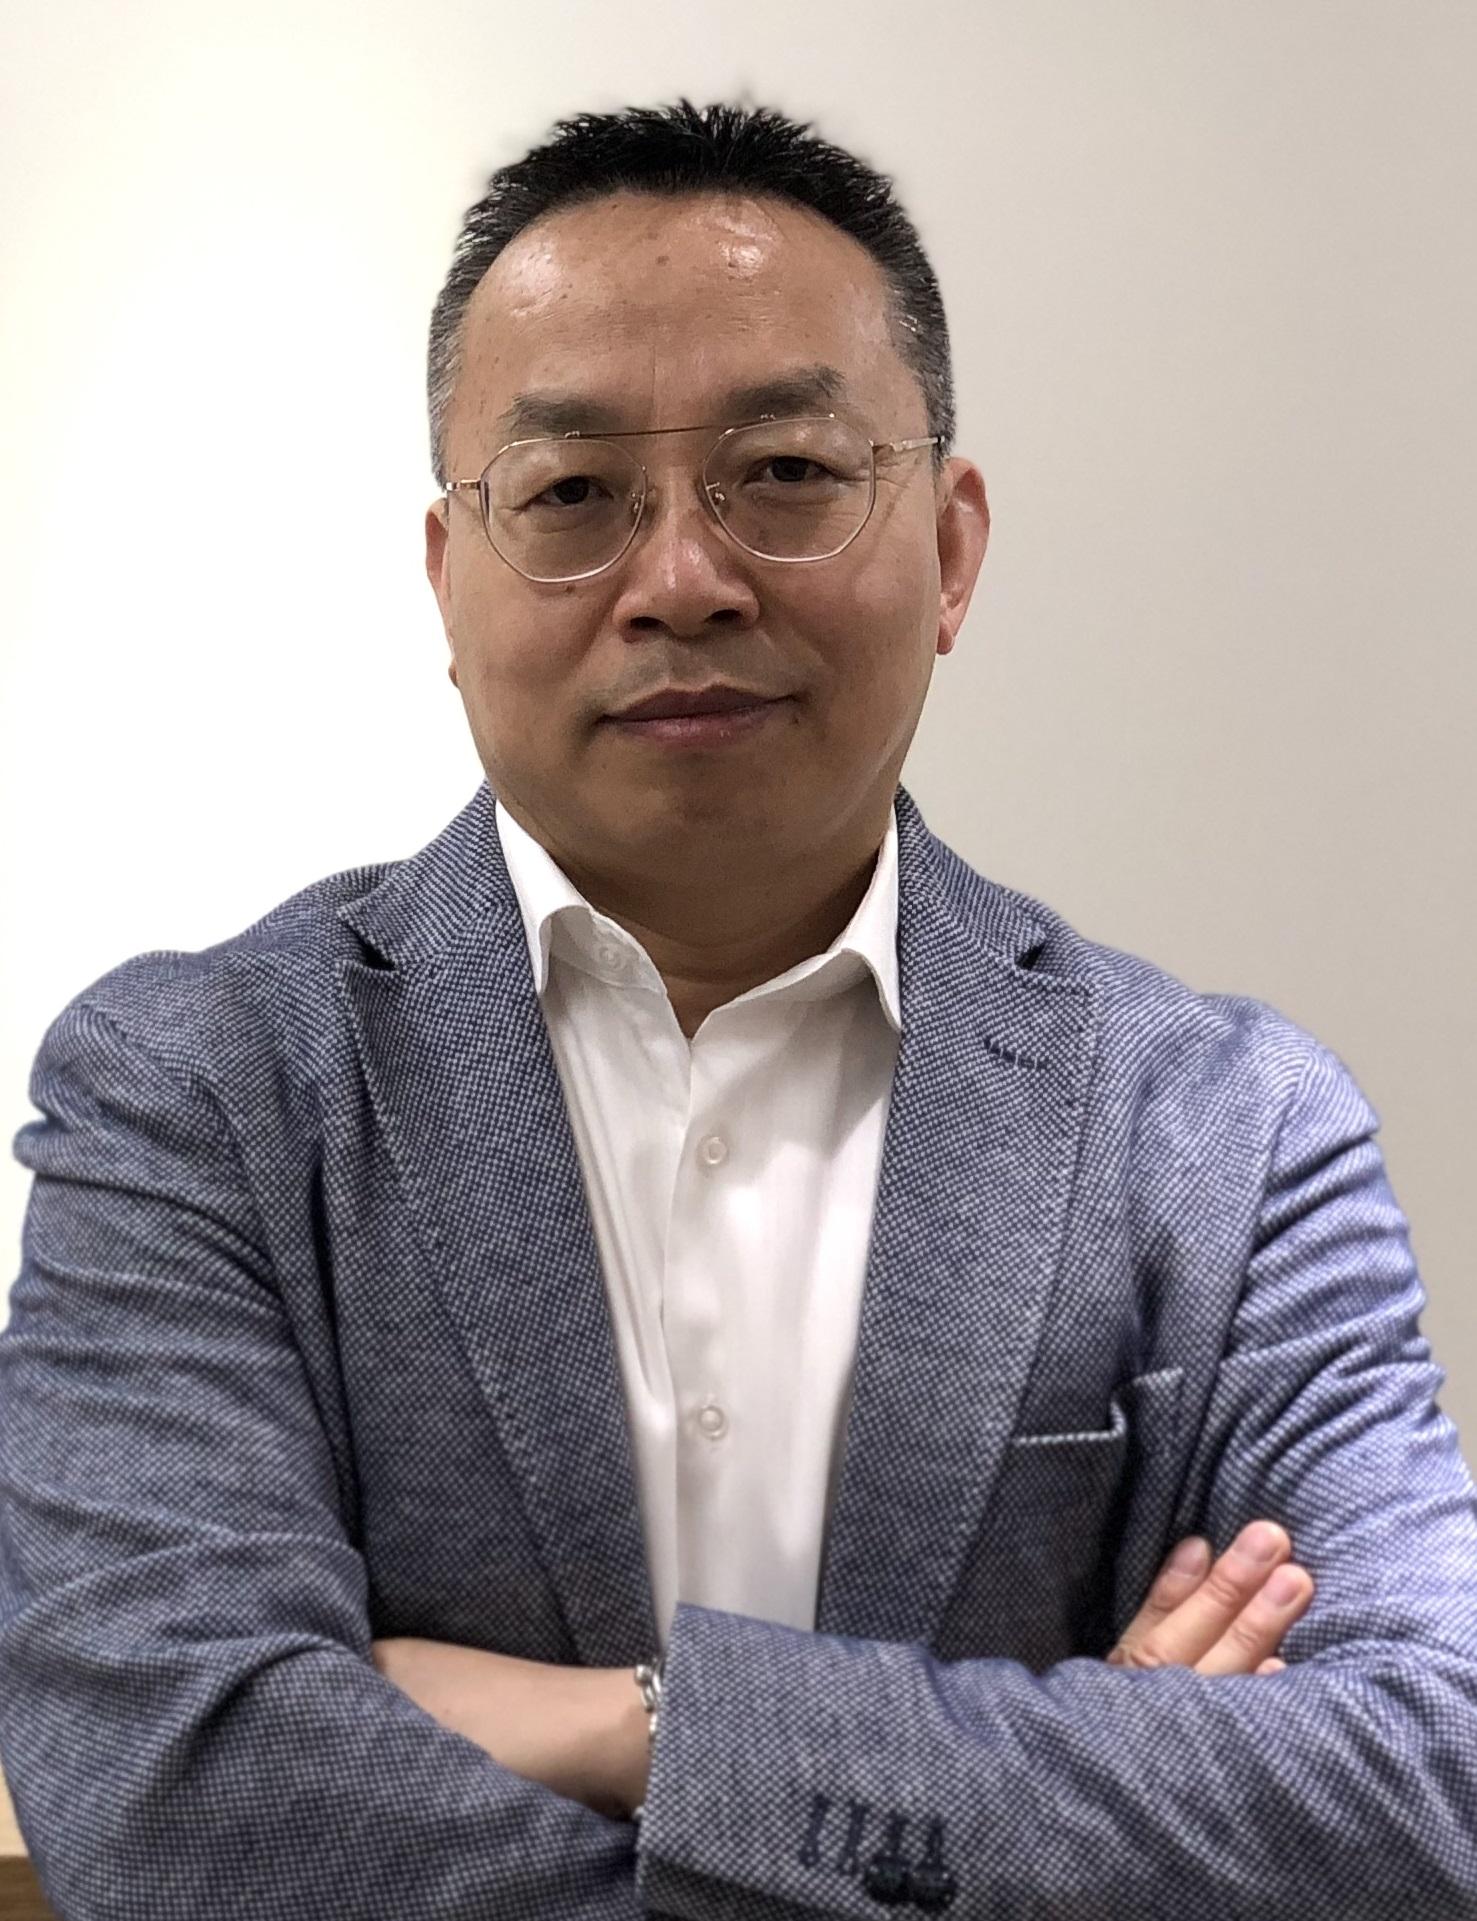 James Li